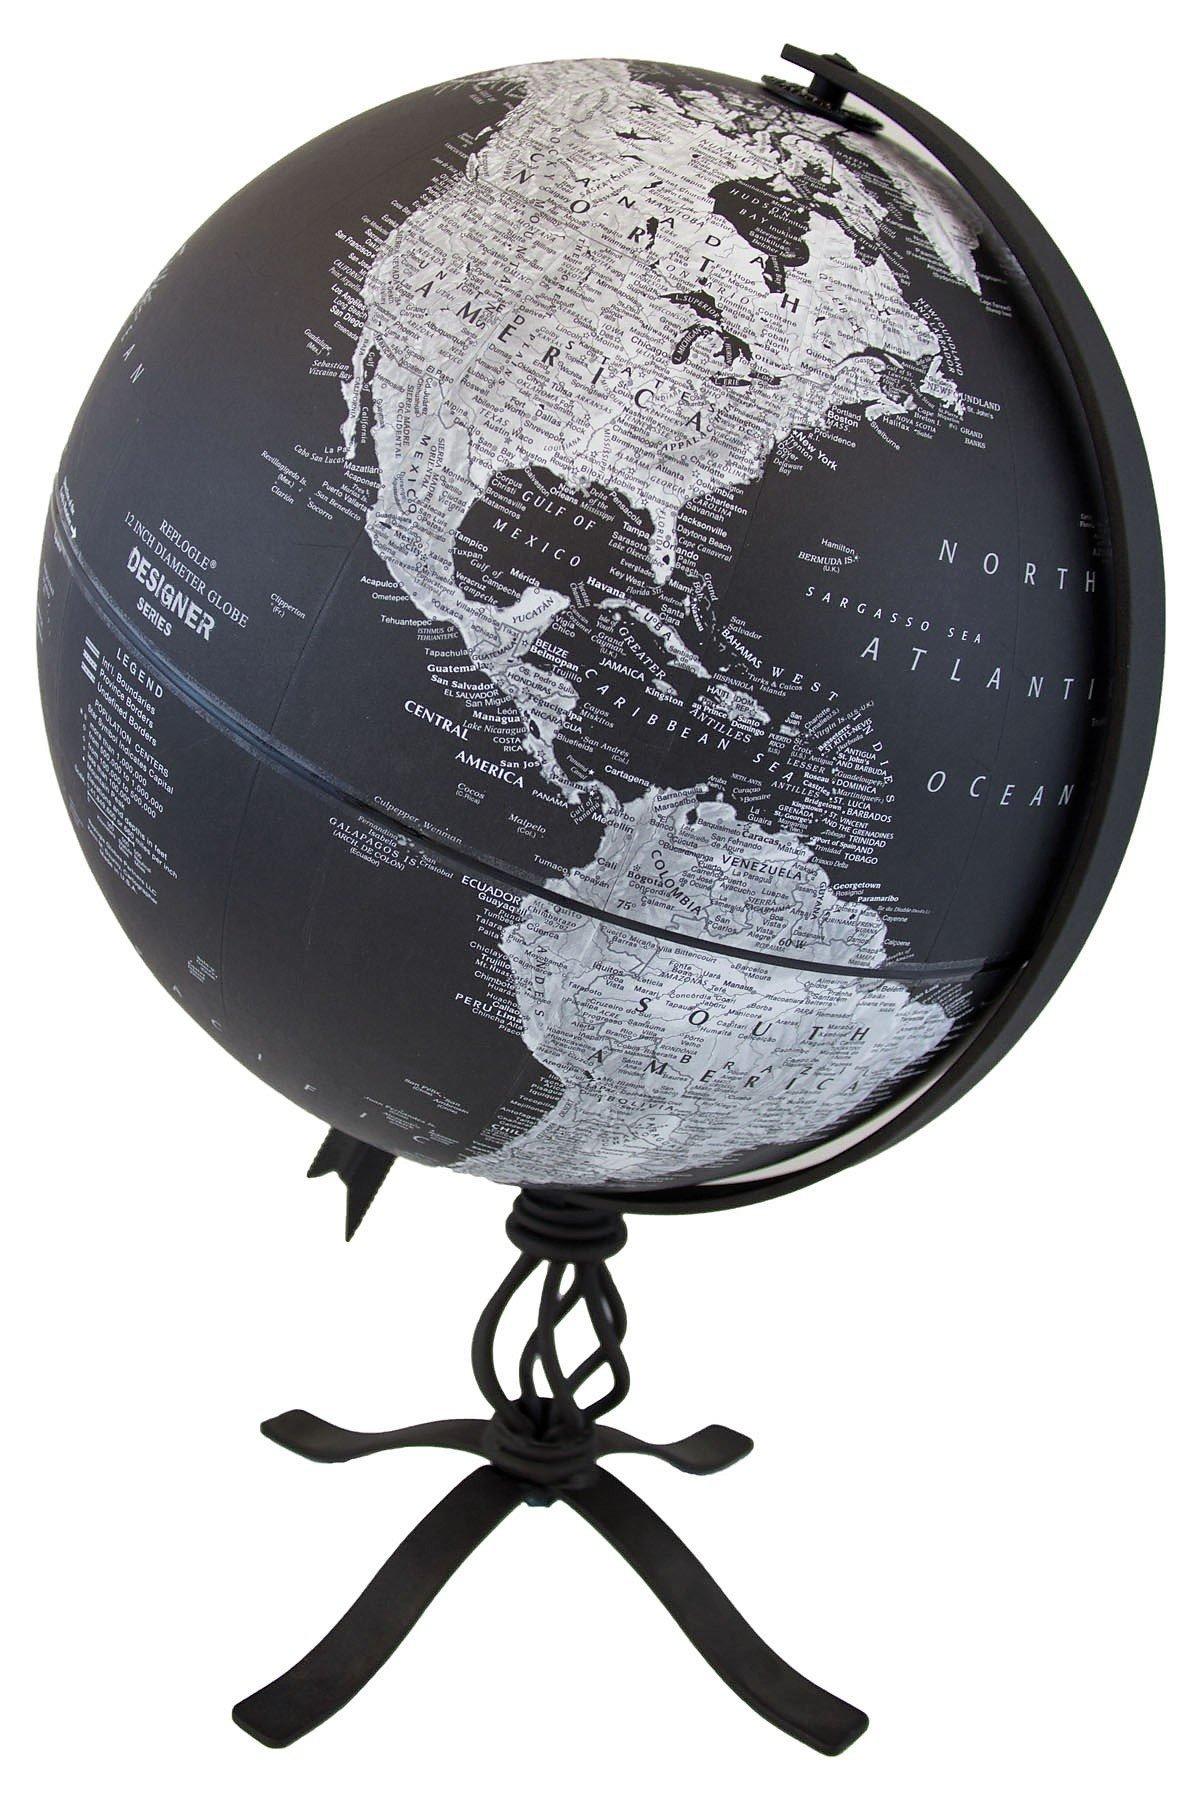 Replogle Hamilton – Designer Series Globe, Black Ocean World Globe, Rustic Black Steel Stand, Raised Relief, Designed for Modern and Industrial Decor (12''/30 cm diameter)